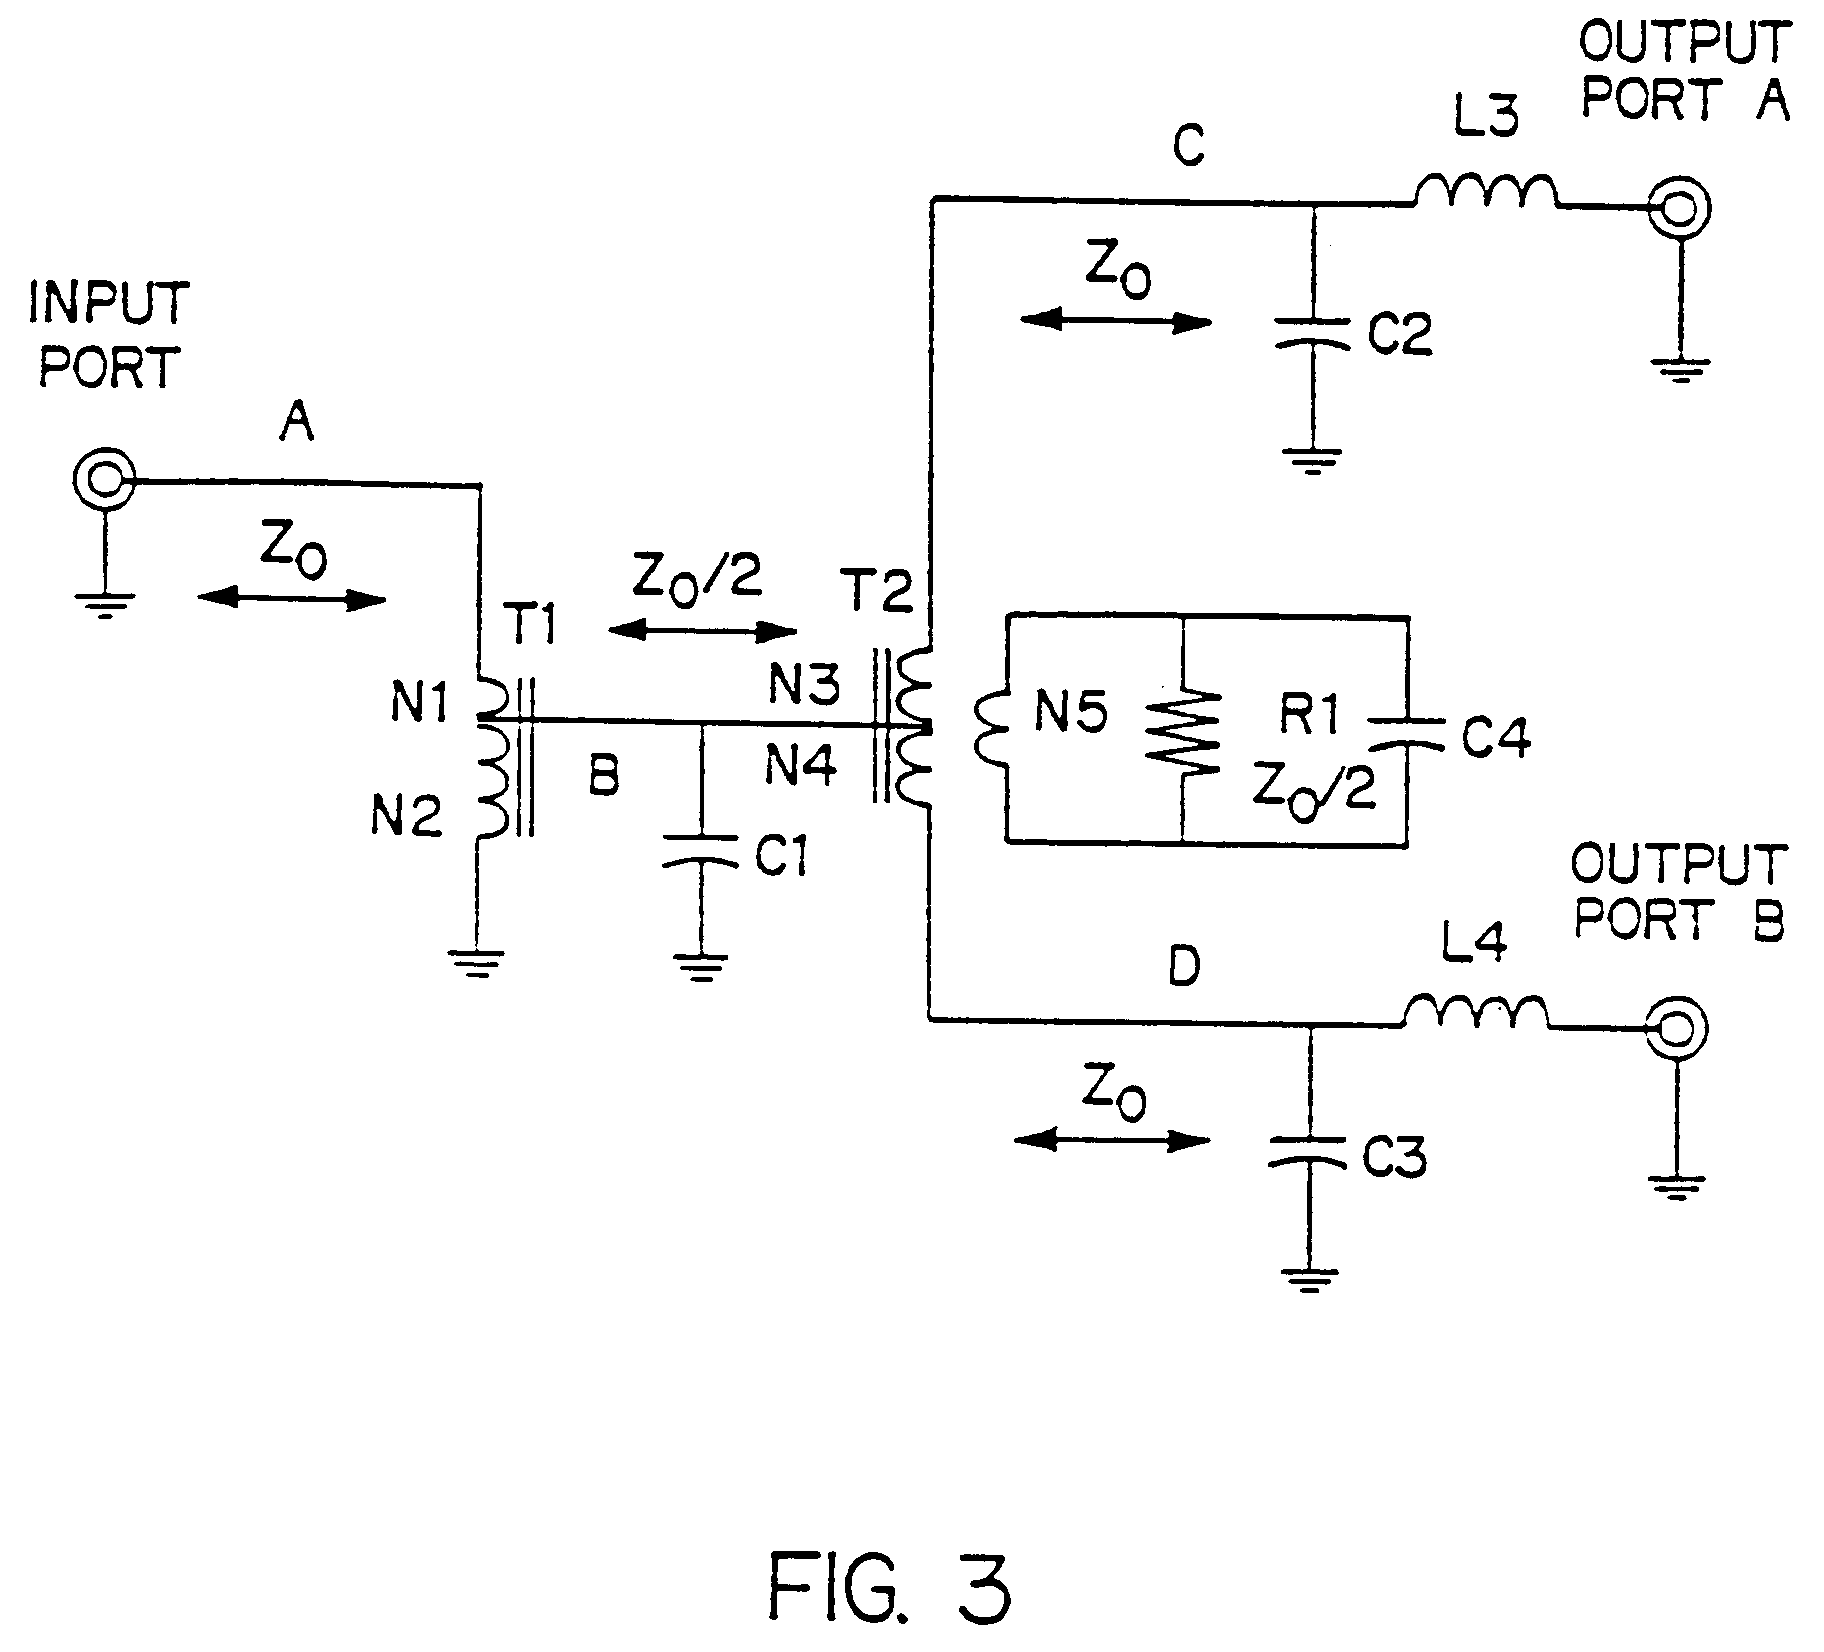 wire rj11 rj45 wire diagram patent ep0652675a1 - catv signal splitter - google patents #14